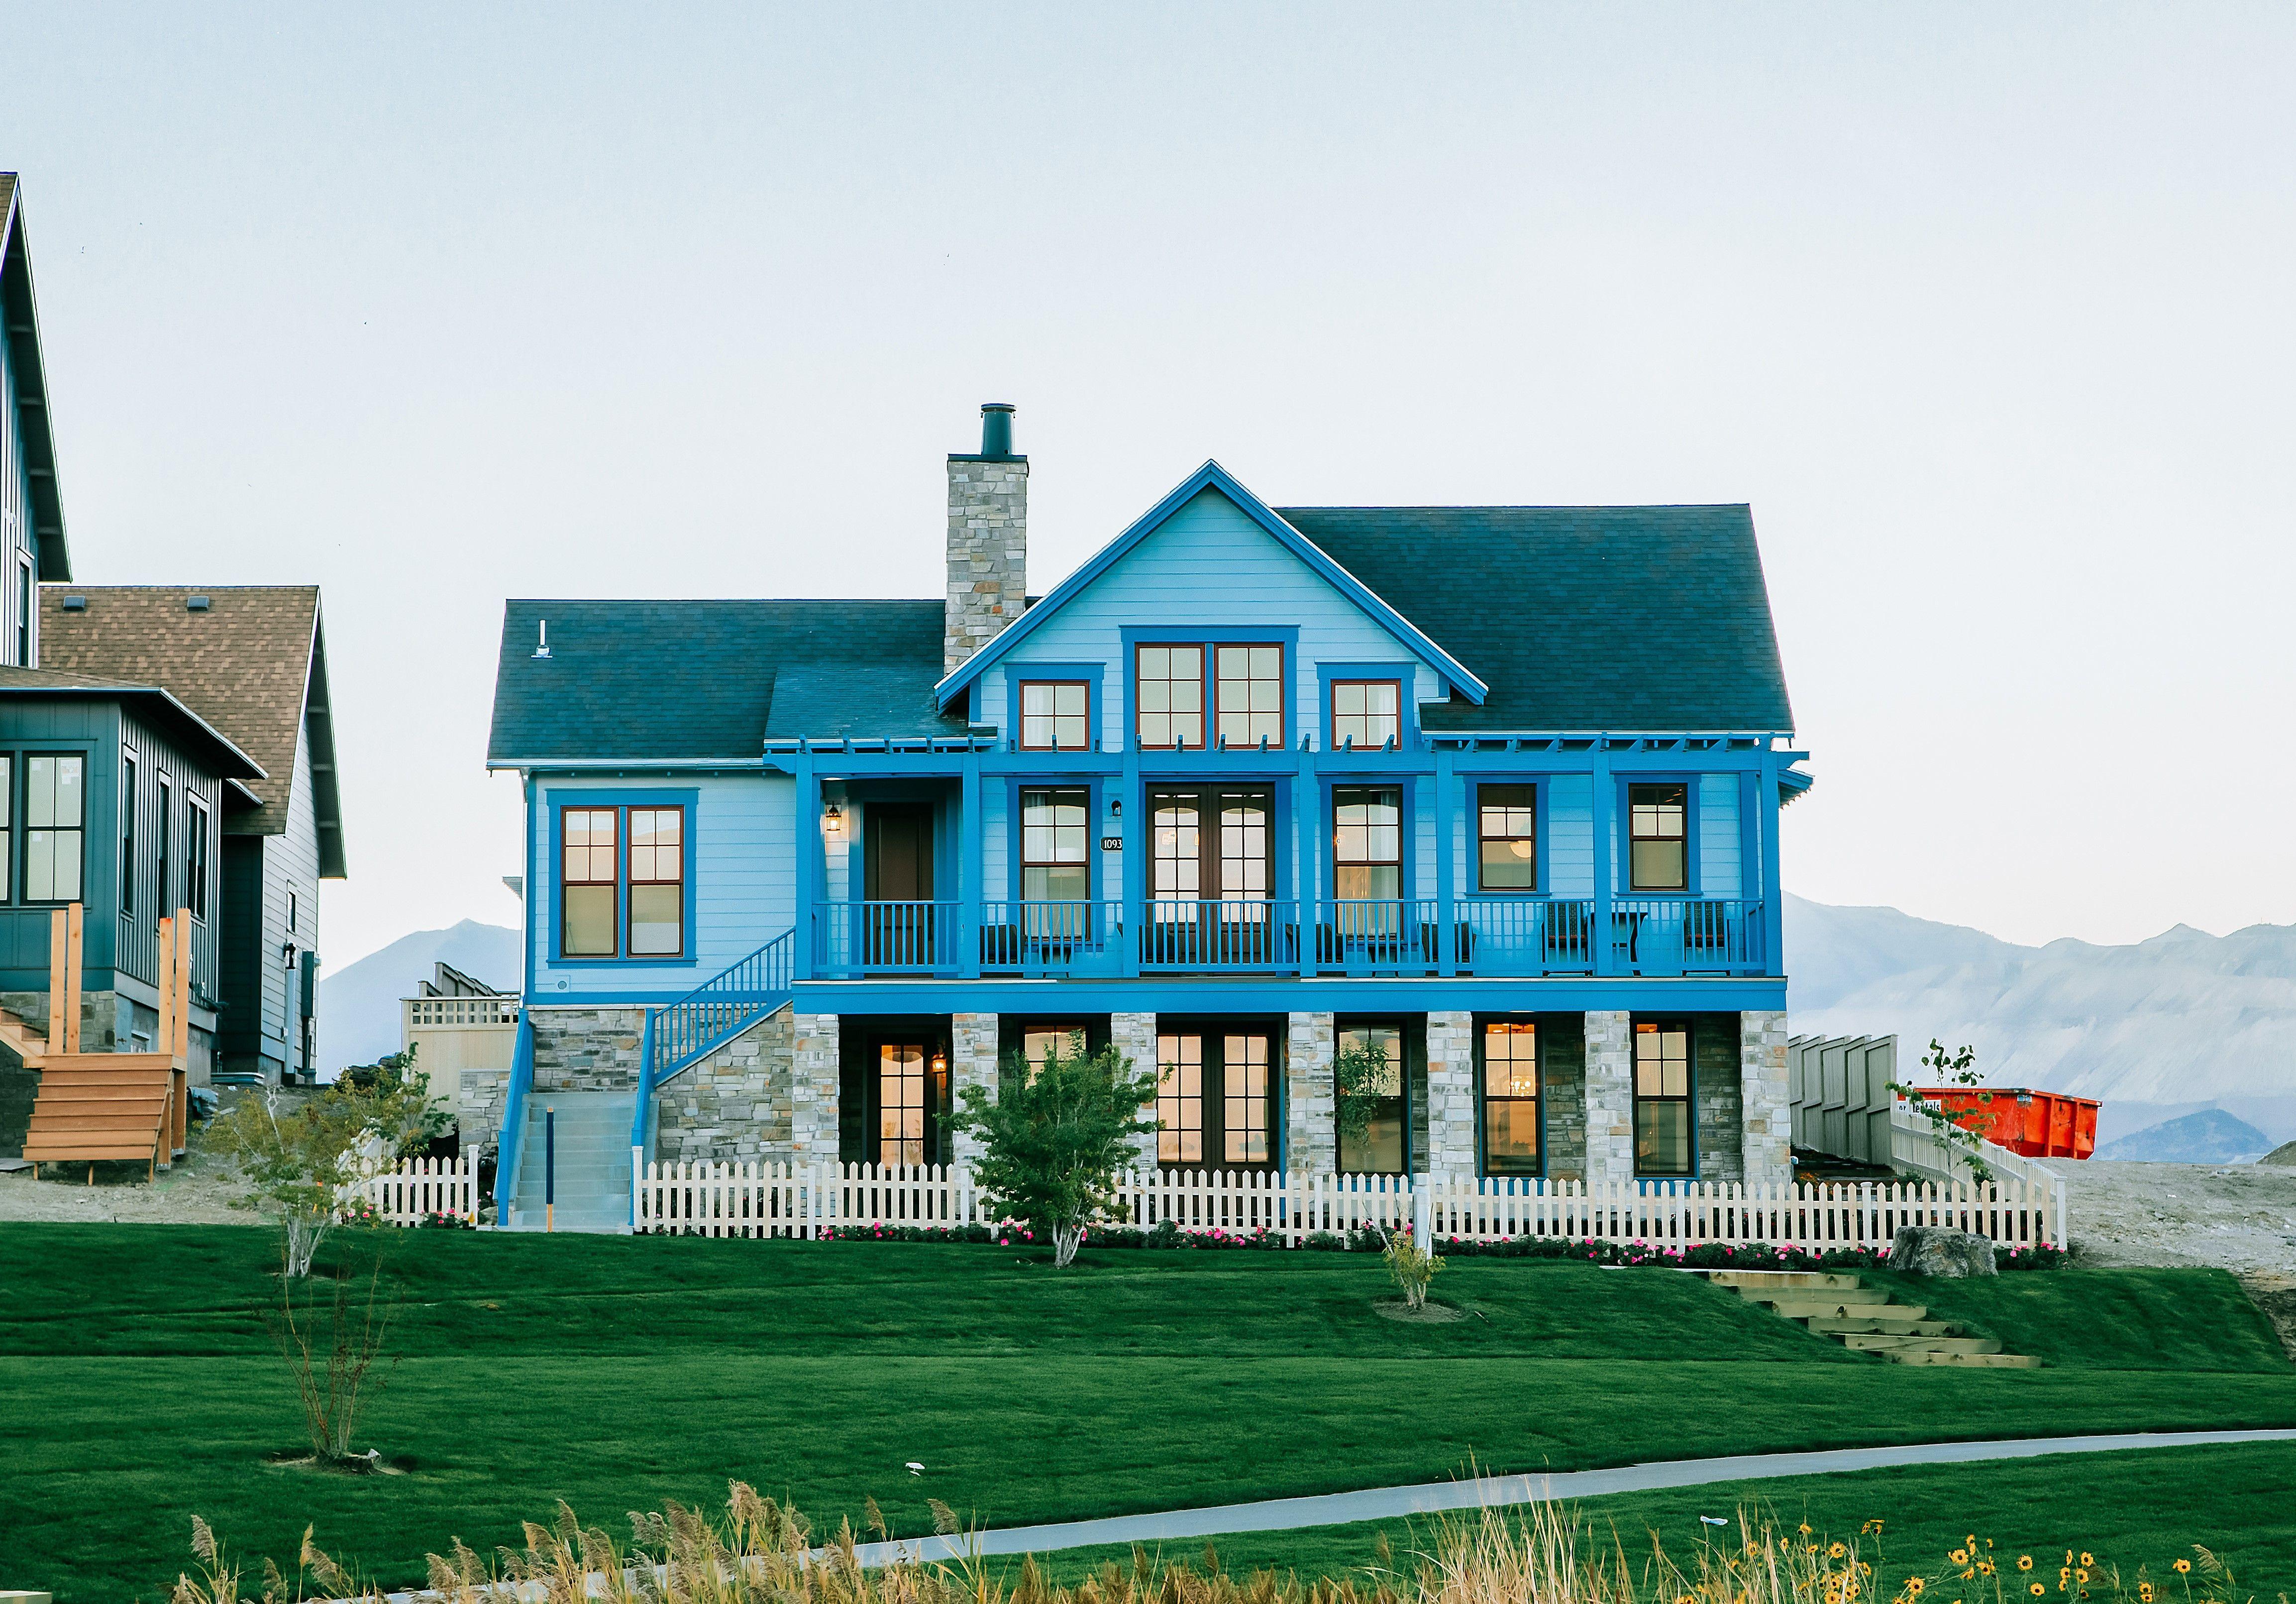 Our New Lake House Model Is Gorgeous Holmes Homes Utah Homebuilder Utah Custom Homes Design I Custom Home Designs Custom Homes Design Your Dream House